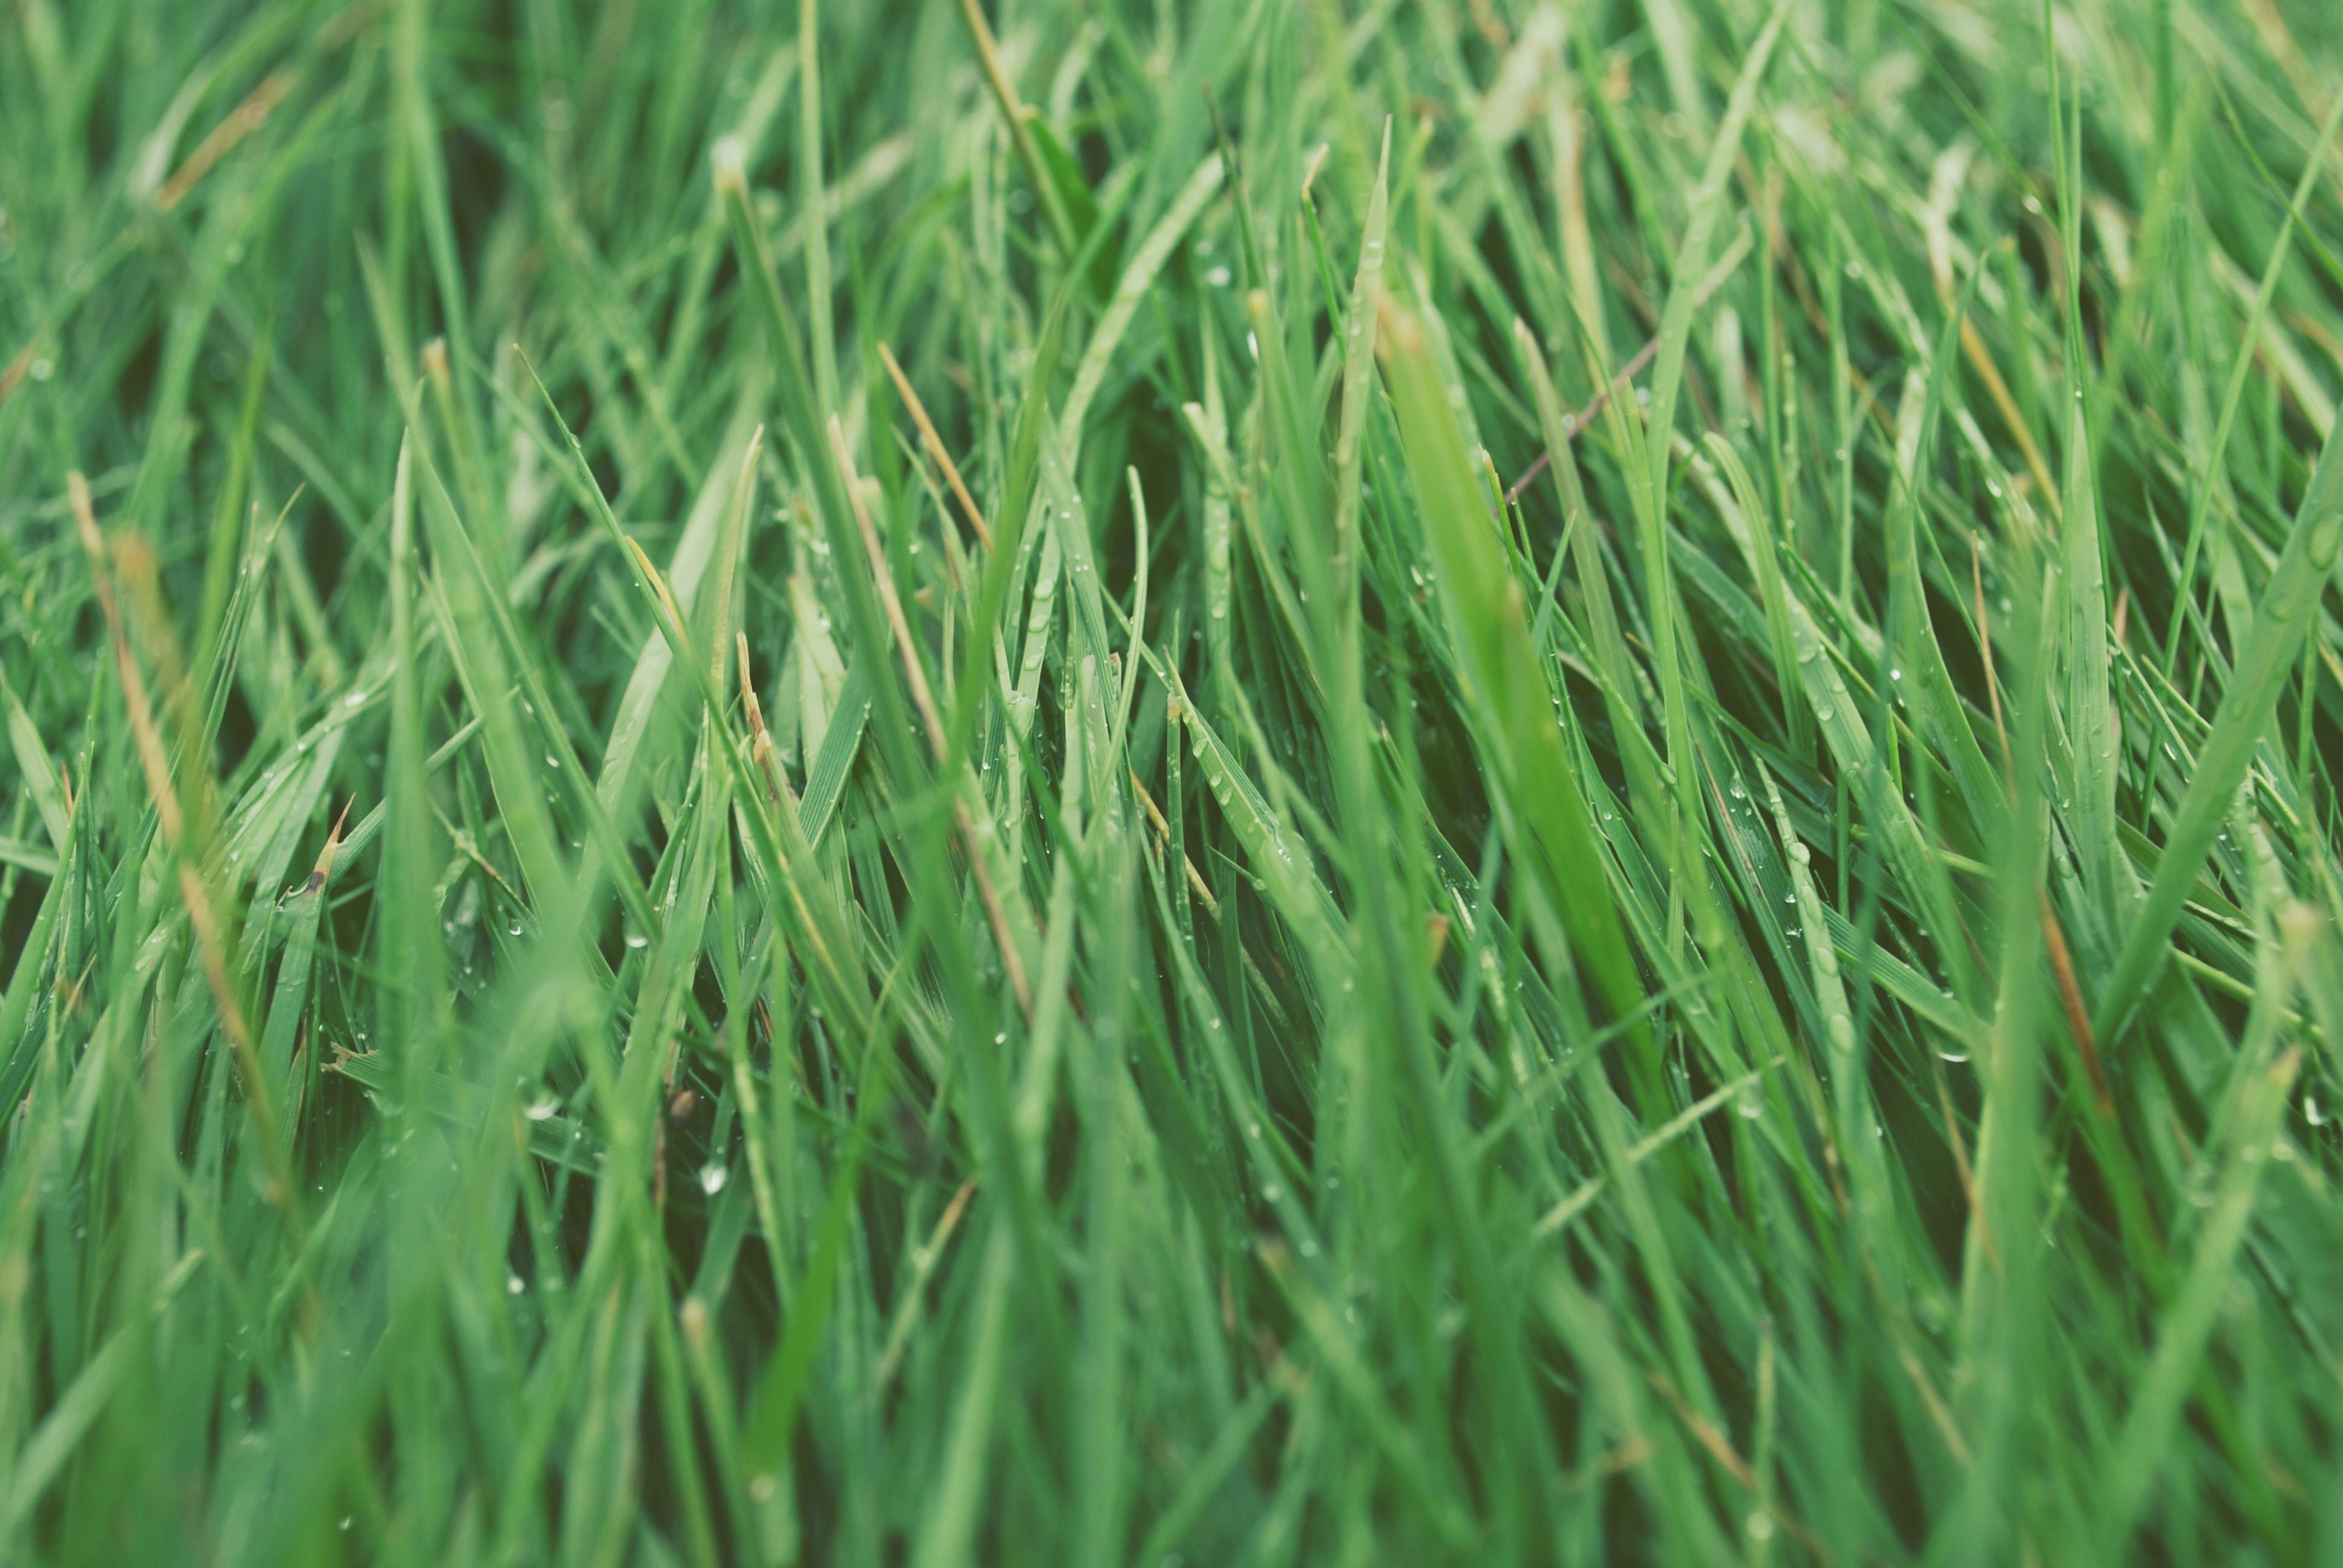 gratis afbeeldingen fabriek veld gazon weide prairie blad groen grasland bevloering. Black Bedroom Furniture Sets. Home Design Ideas